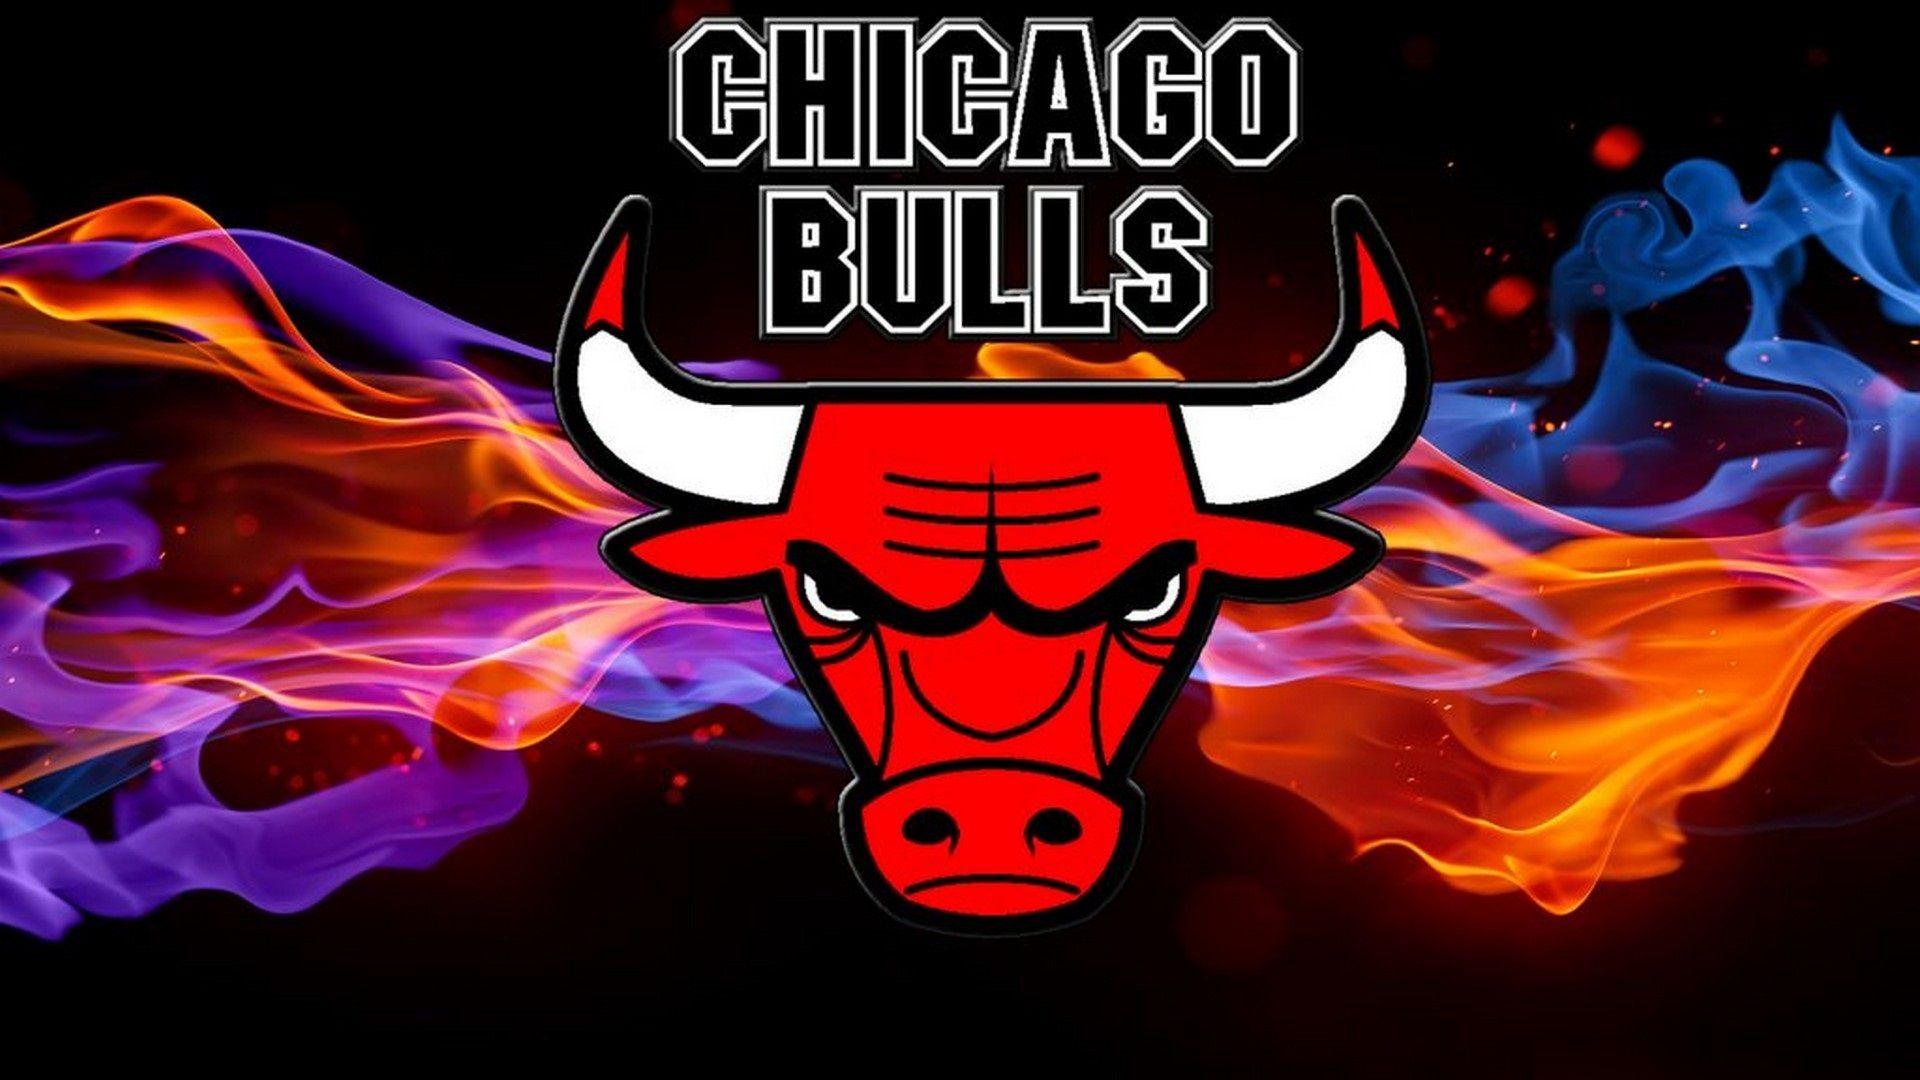 Chicago Bulls Wallpaper For Mac Backgrounds 2021 Basketball Wallpaper Chicago Bulls Wallpaper Bulls Wallpaper Chicago Bulls